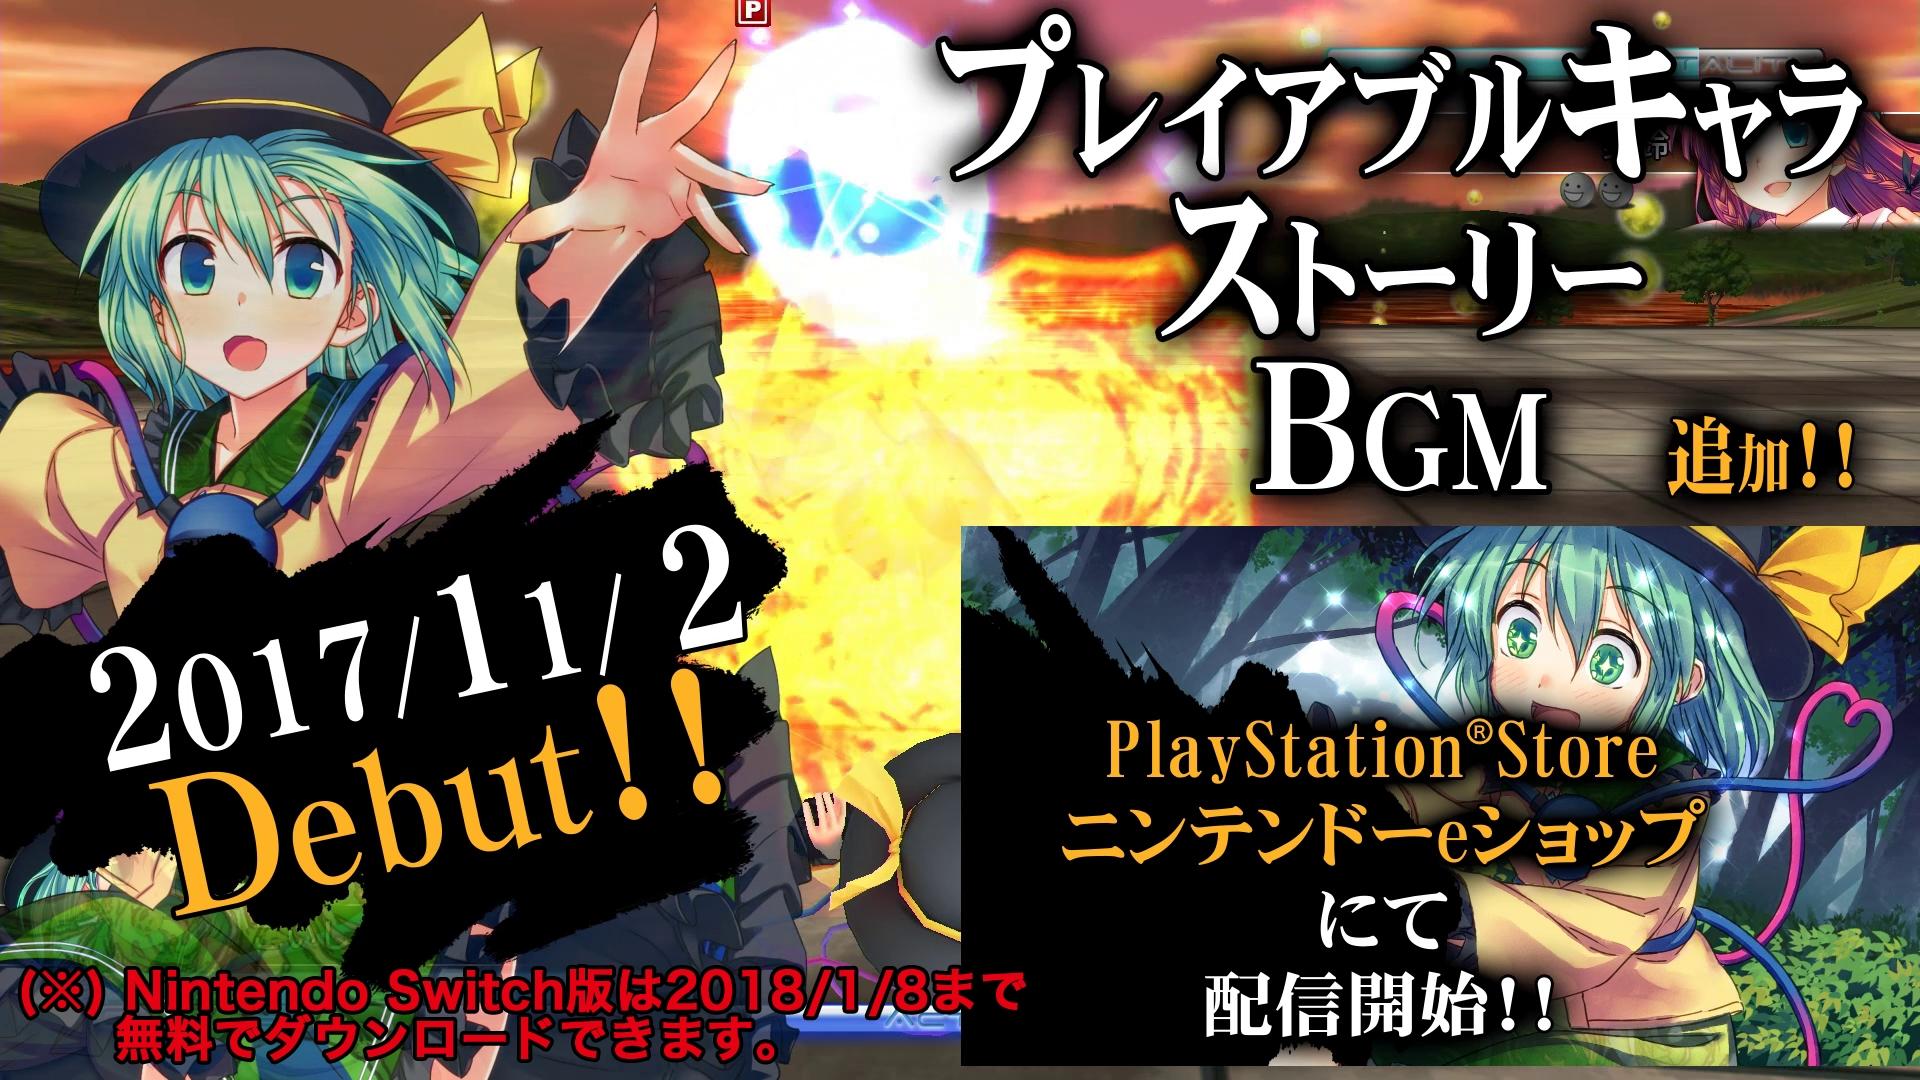 画像集 002 Nintendo Switch版 東方紅舞闘v が本日発売 古明地